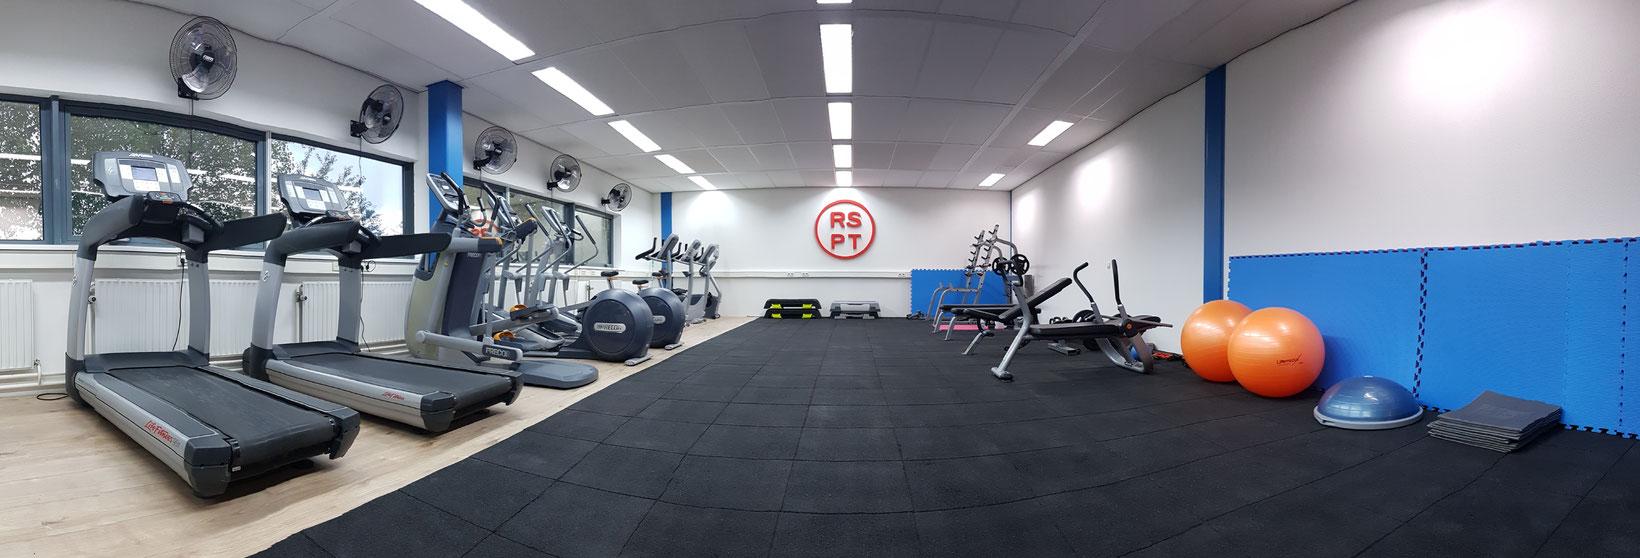 Fitness Zaal Boven   Taekwon-Do Nieuwegein